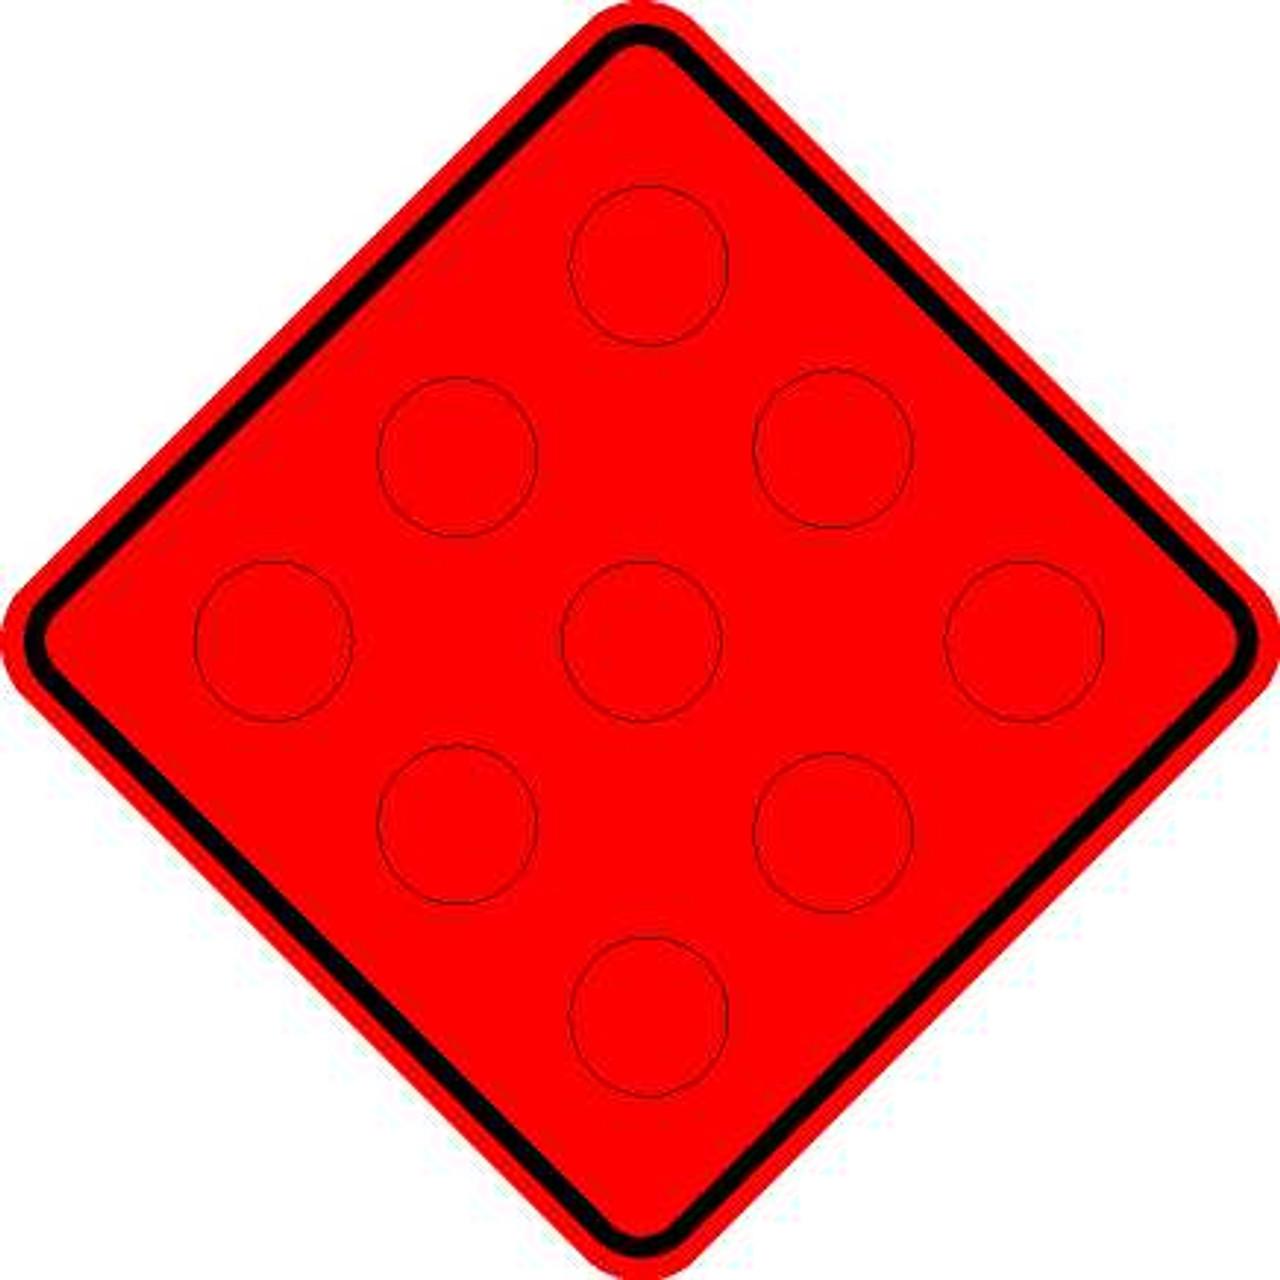 N5 MARKER RED W/REFLECTORS